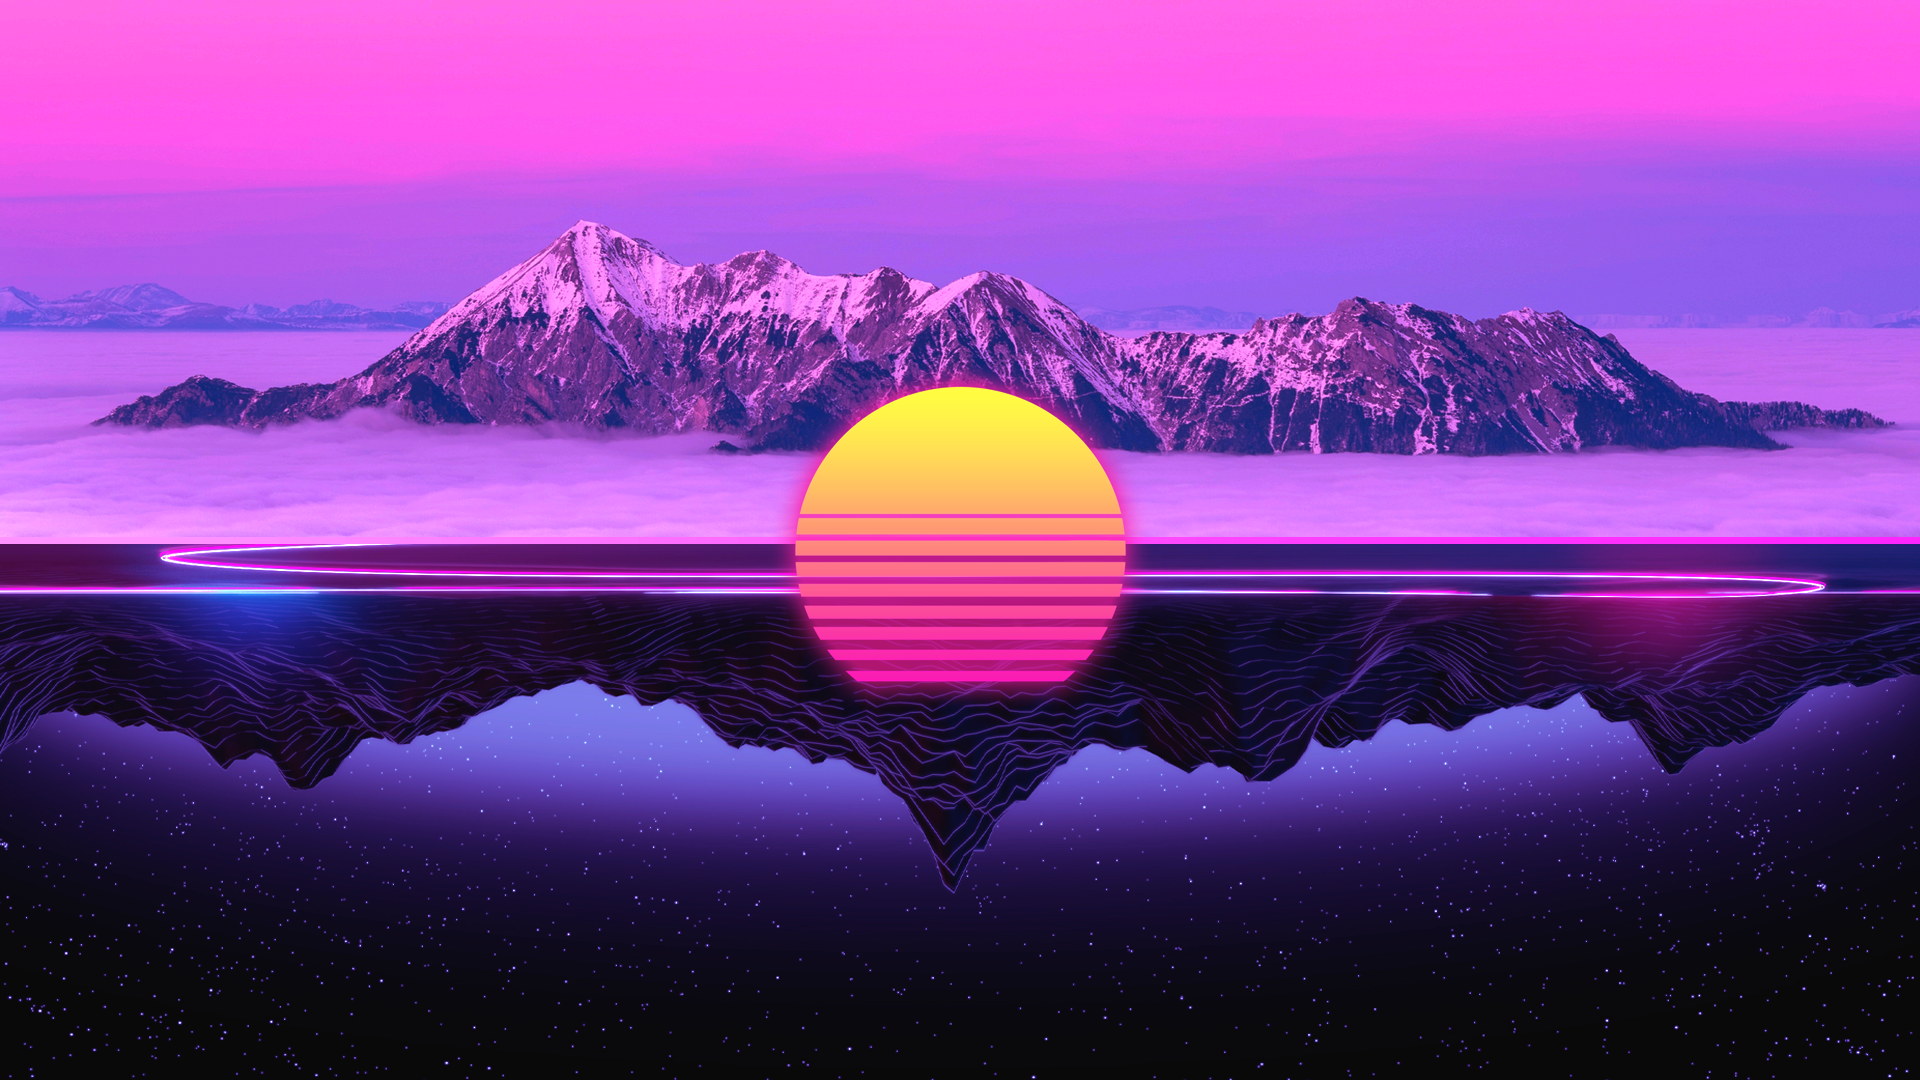 General 1920x1080 landscape Retrowave neon digital art mountains